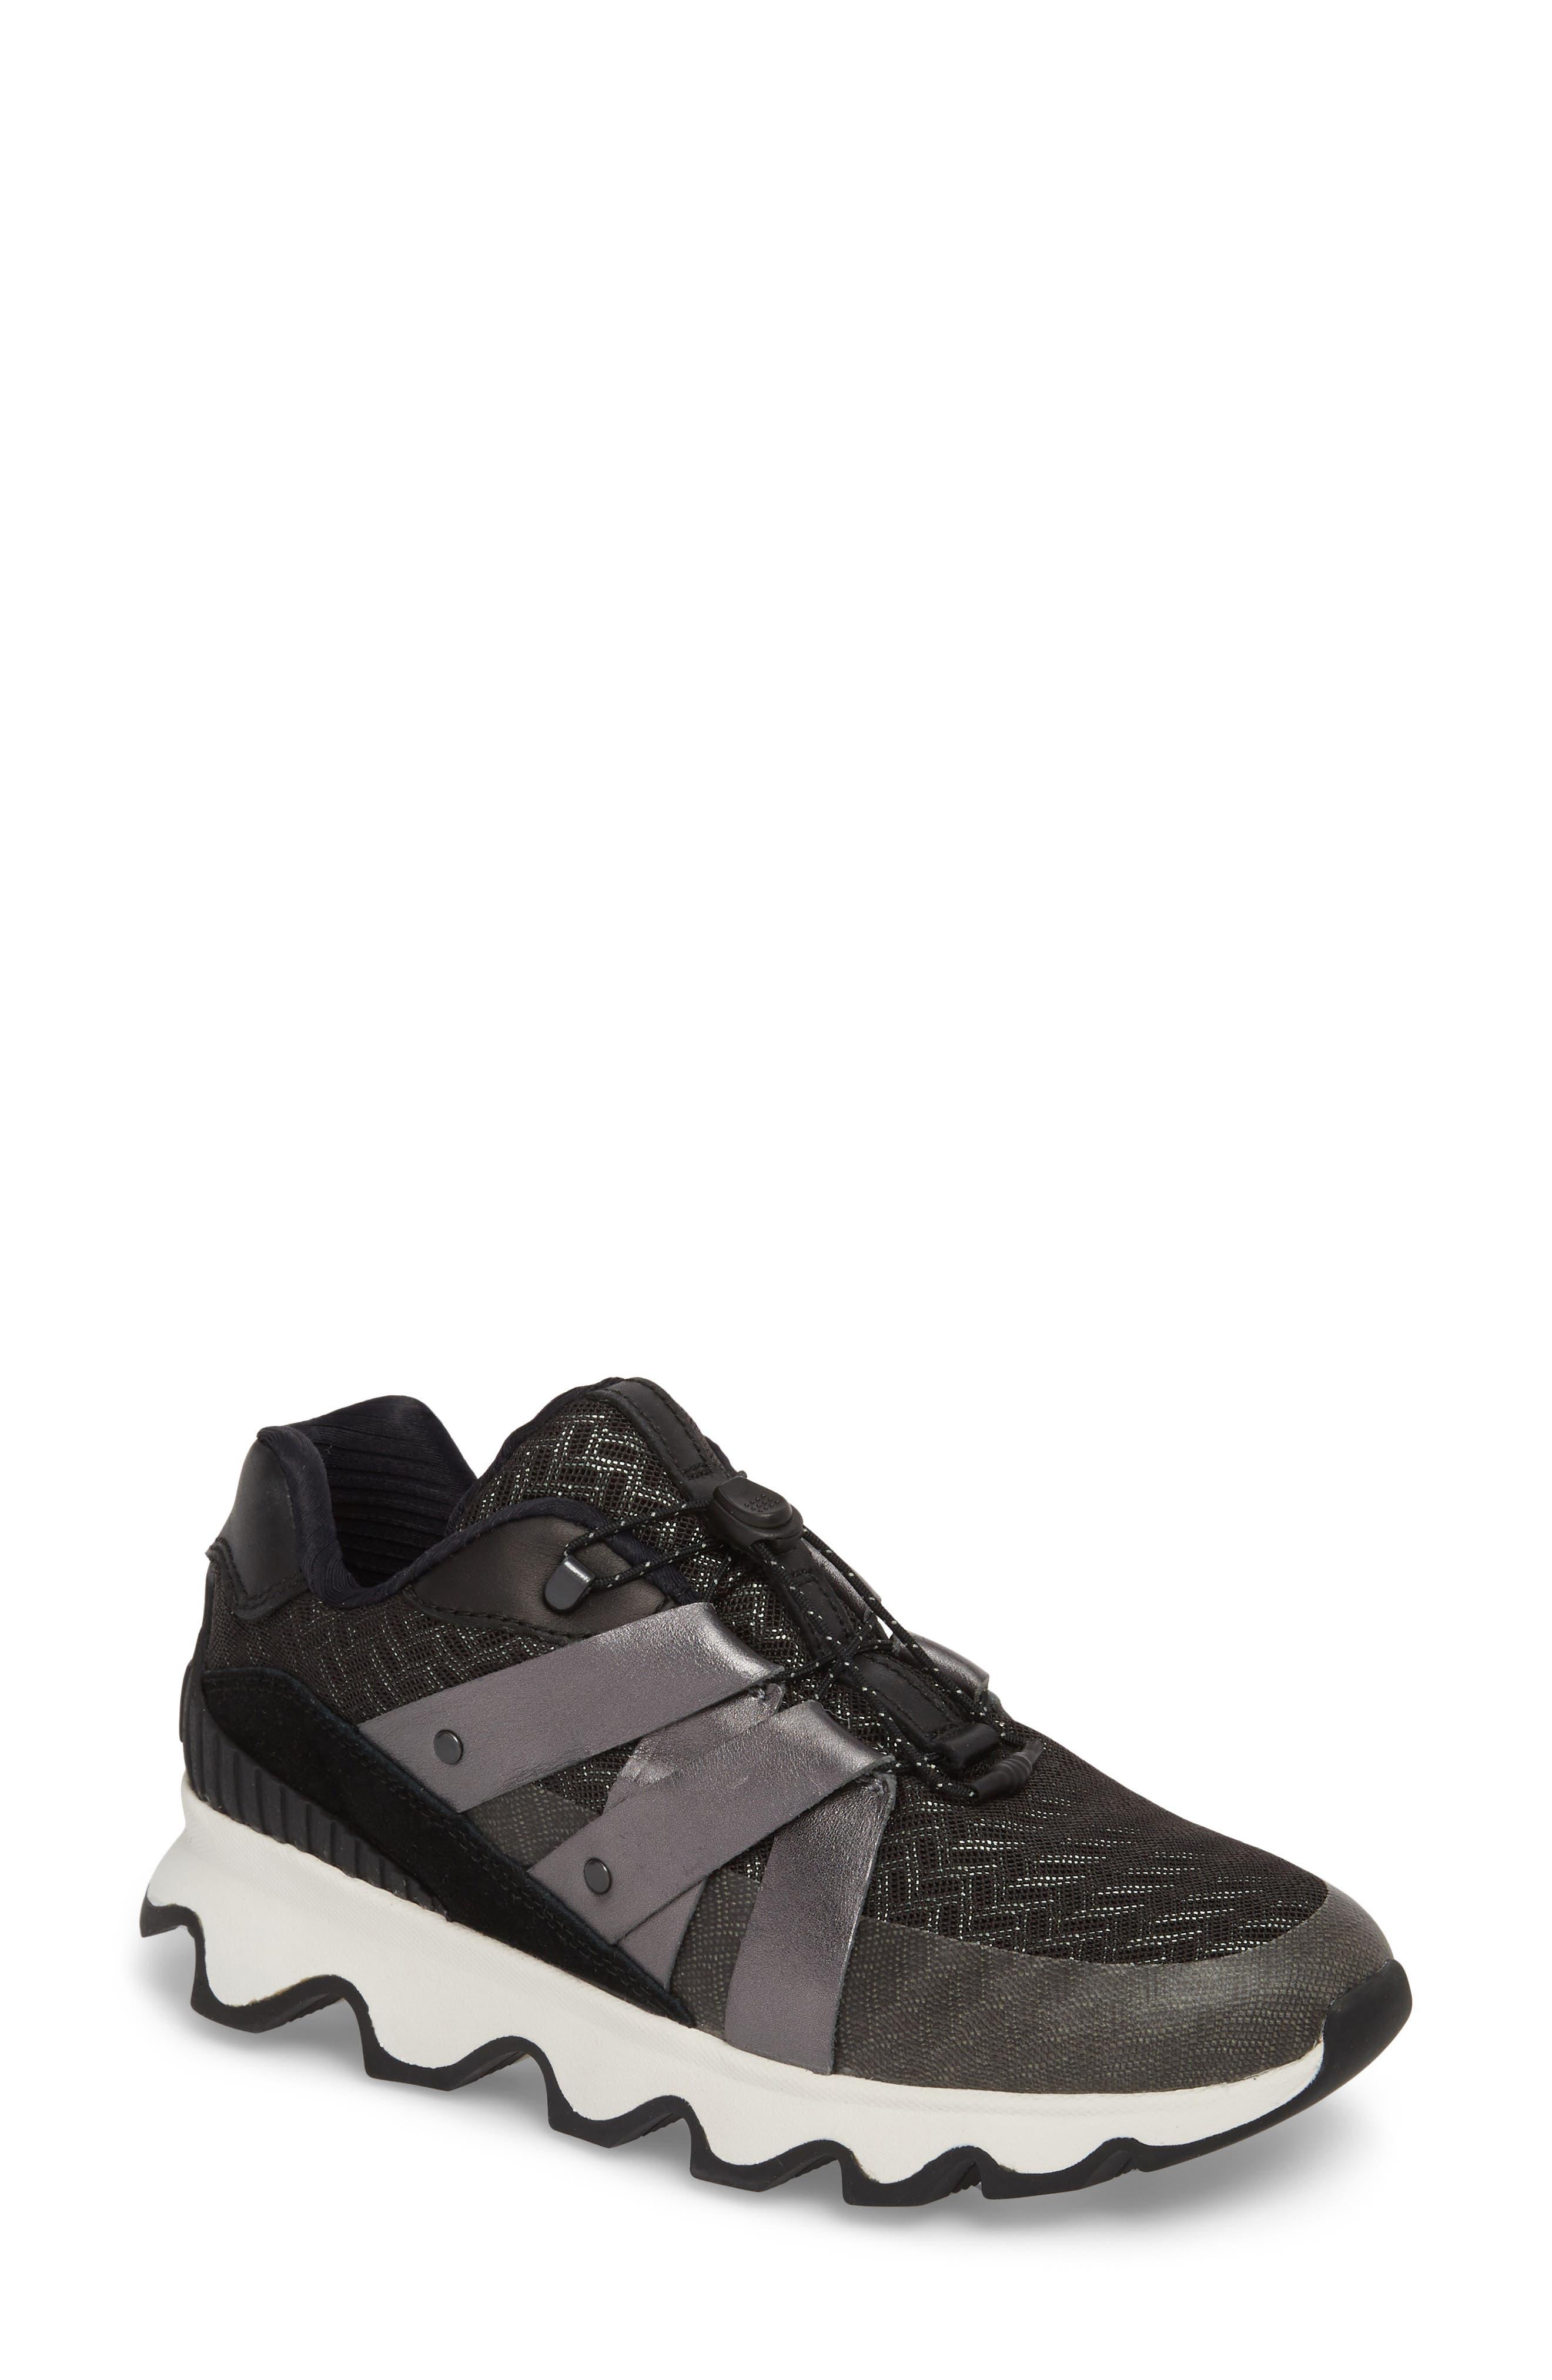 Kinetic Speed Sneaker,                         Main,                         color, Black/ Sea Salt